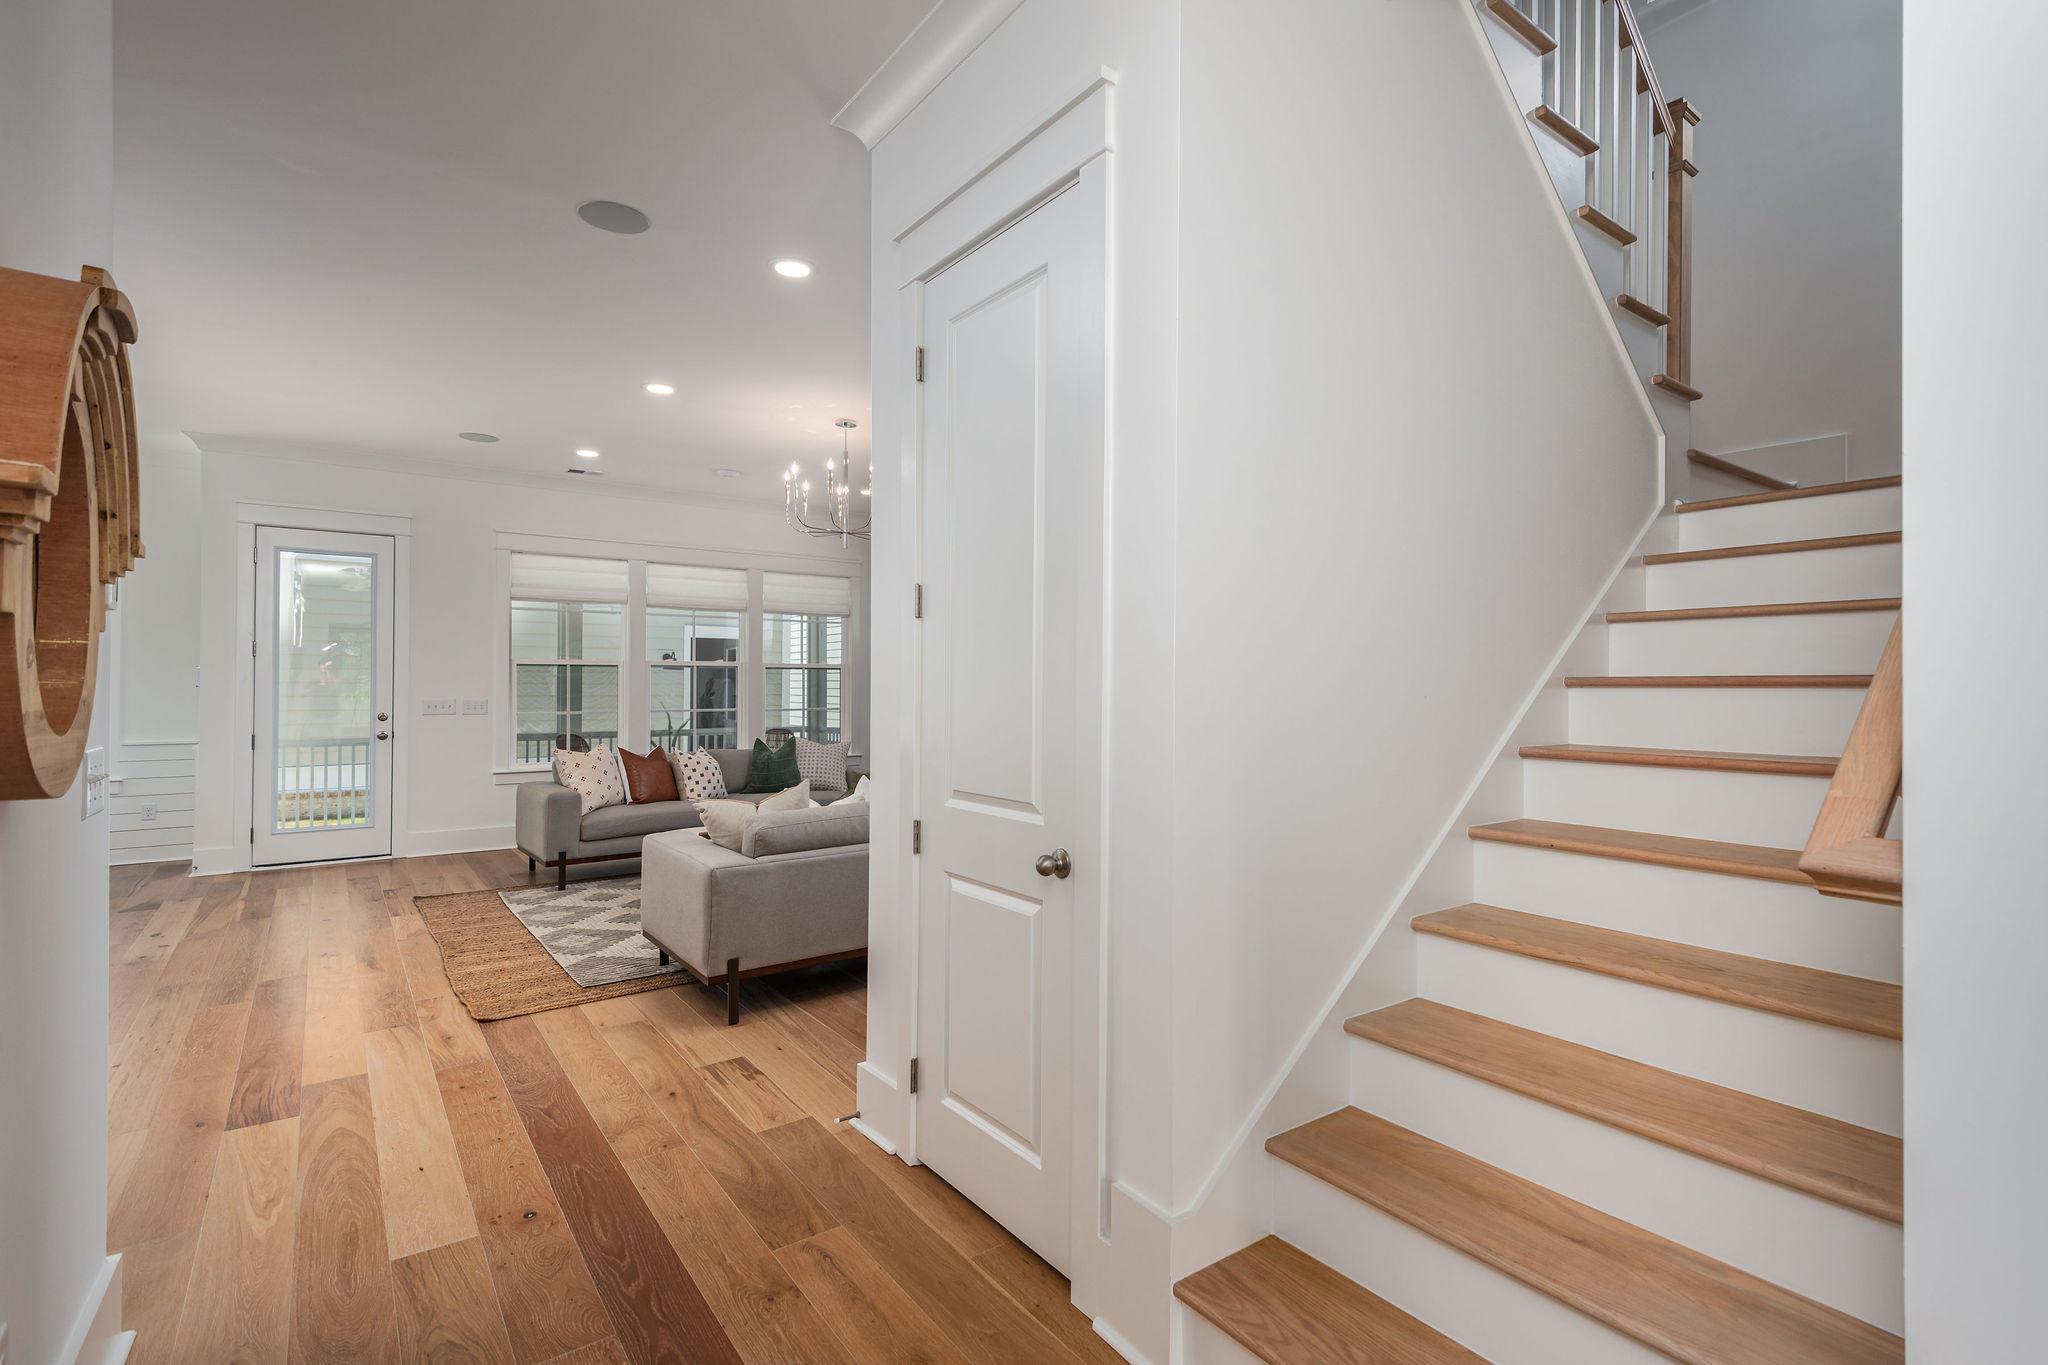 Midtown Homes For Sale - 1344 Upper Union, Mount Pleasant, SC - 7